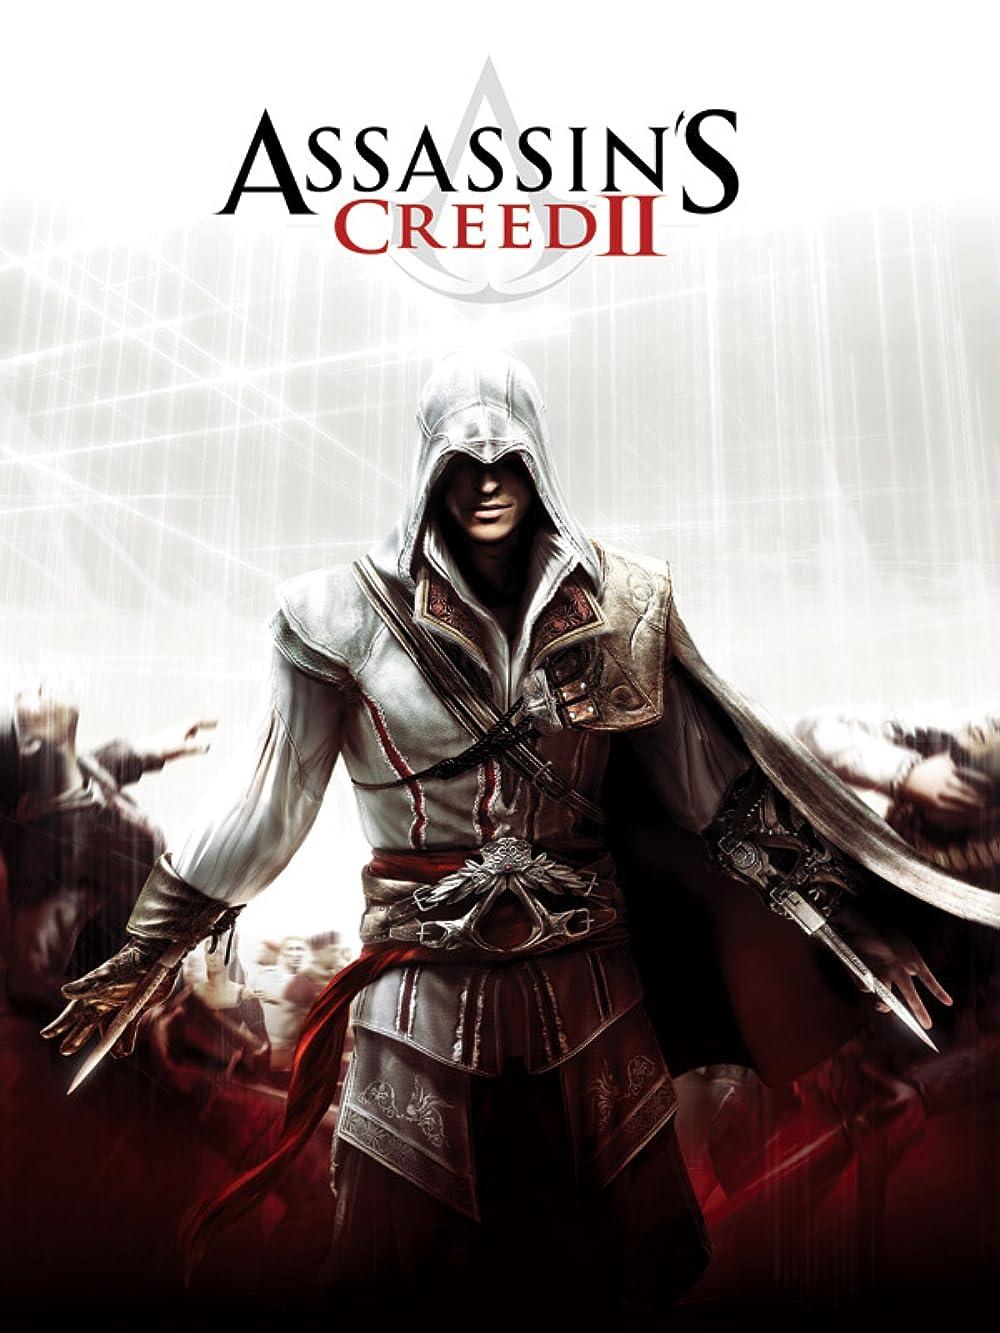 Assassin's Creed II (Video Game 2009) - IMDb